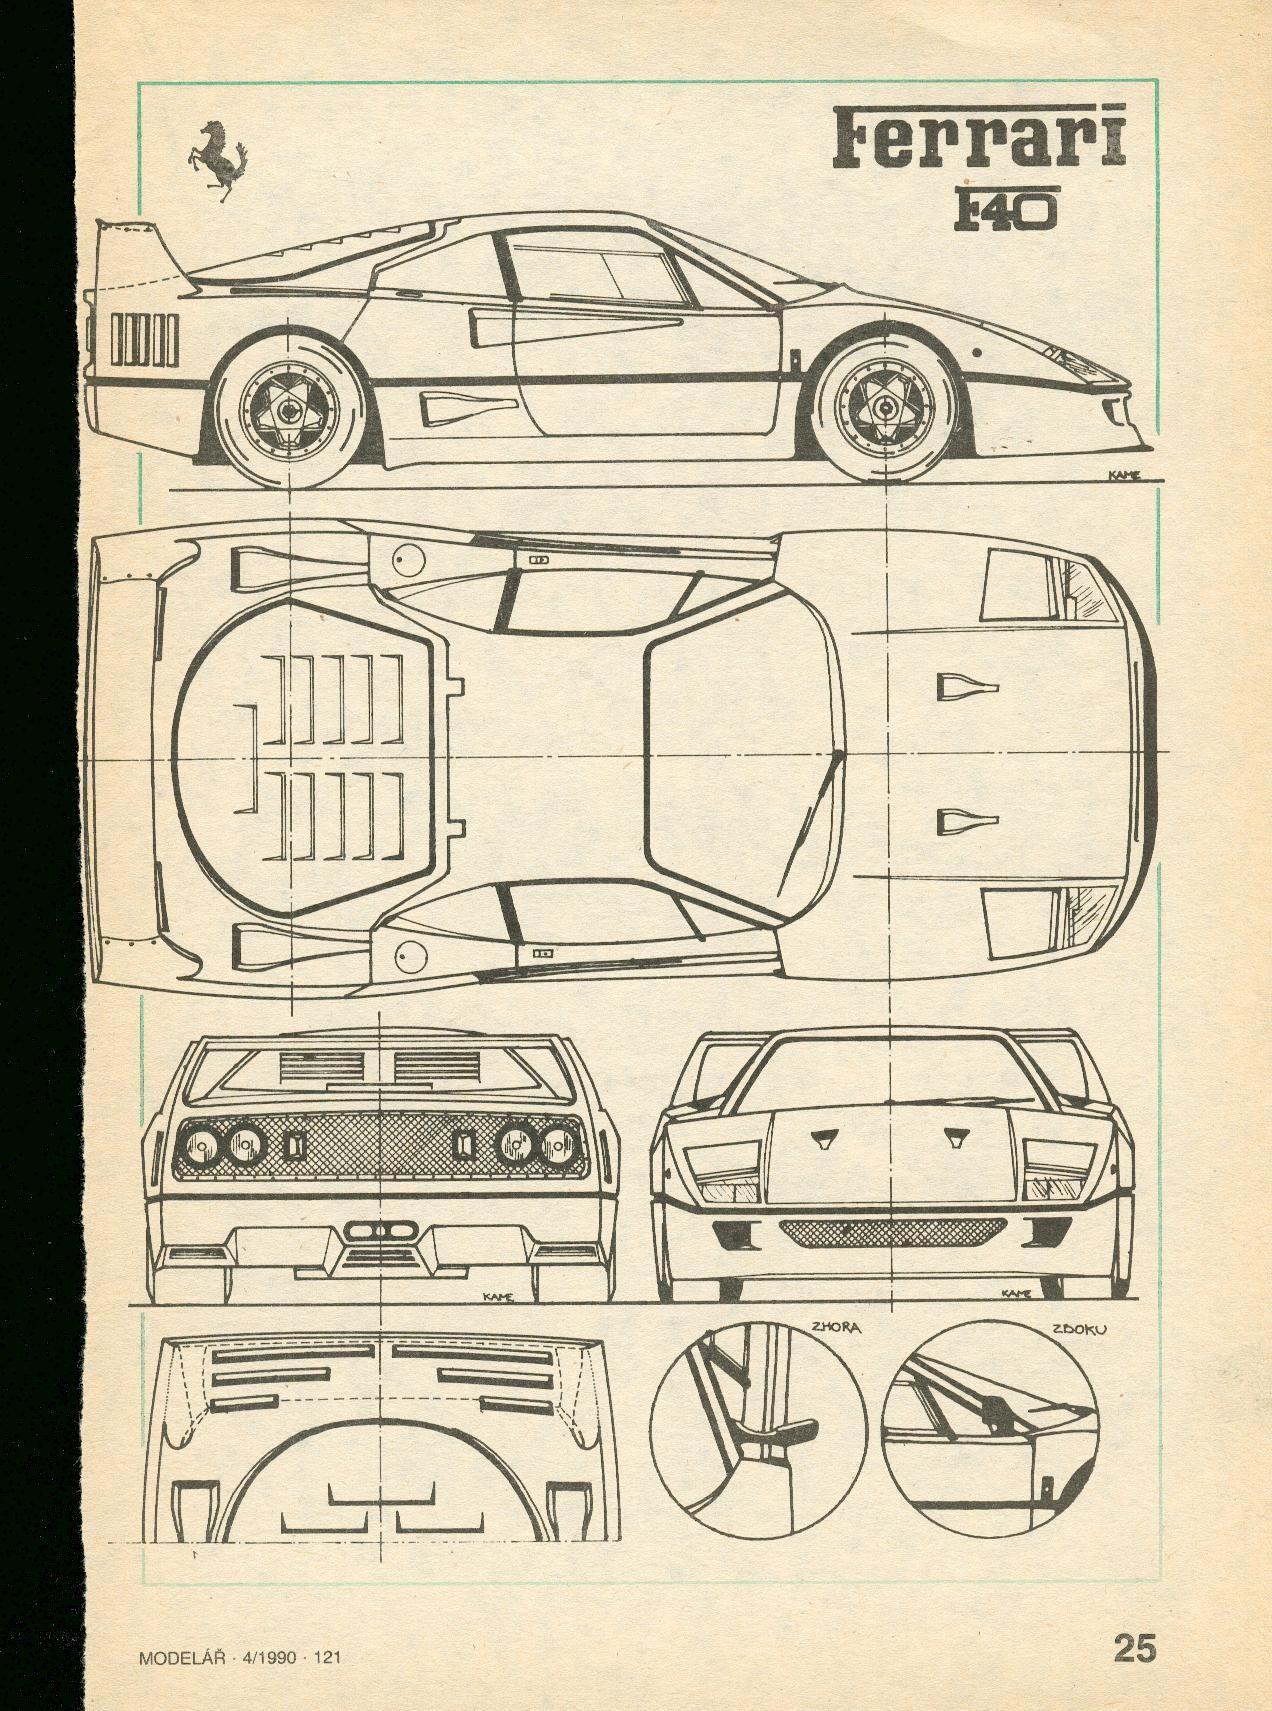 The 2015 nissan gtr ferrari f40 ferrari and cars ferrari f40 smcars car blueprints forum malvernweather Gallery